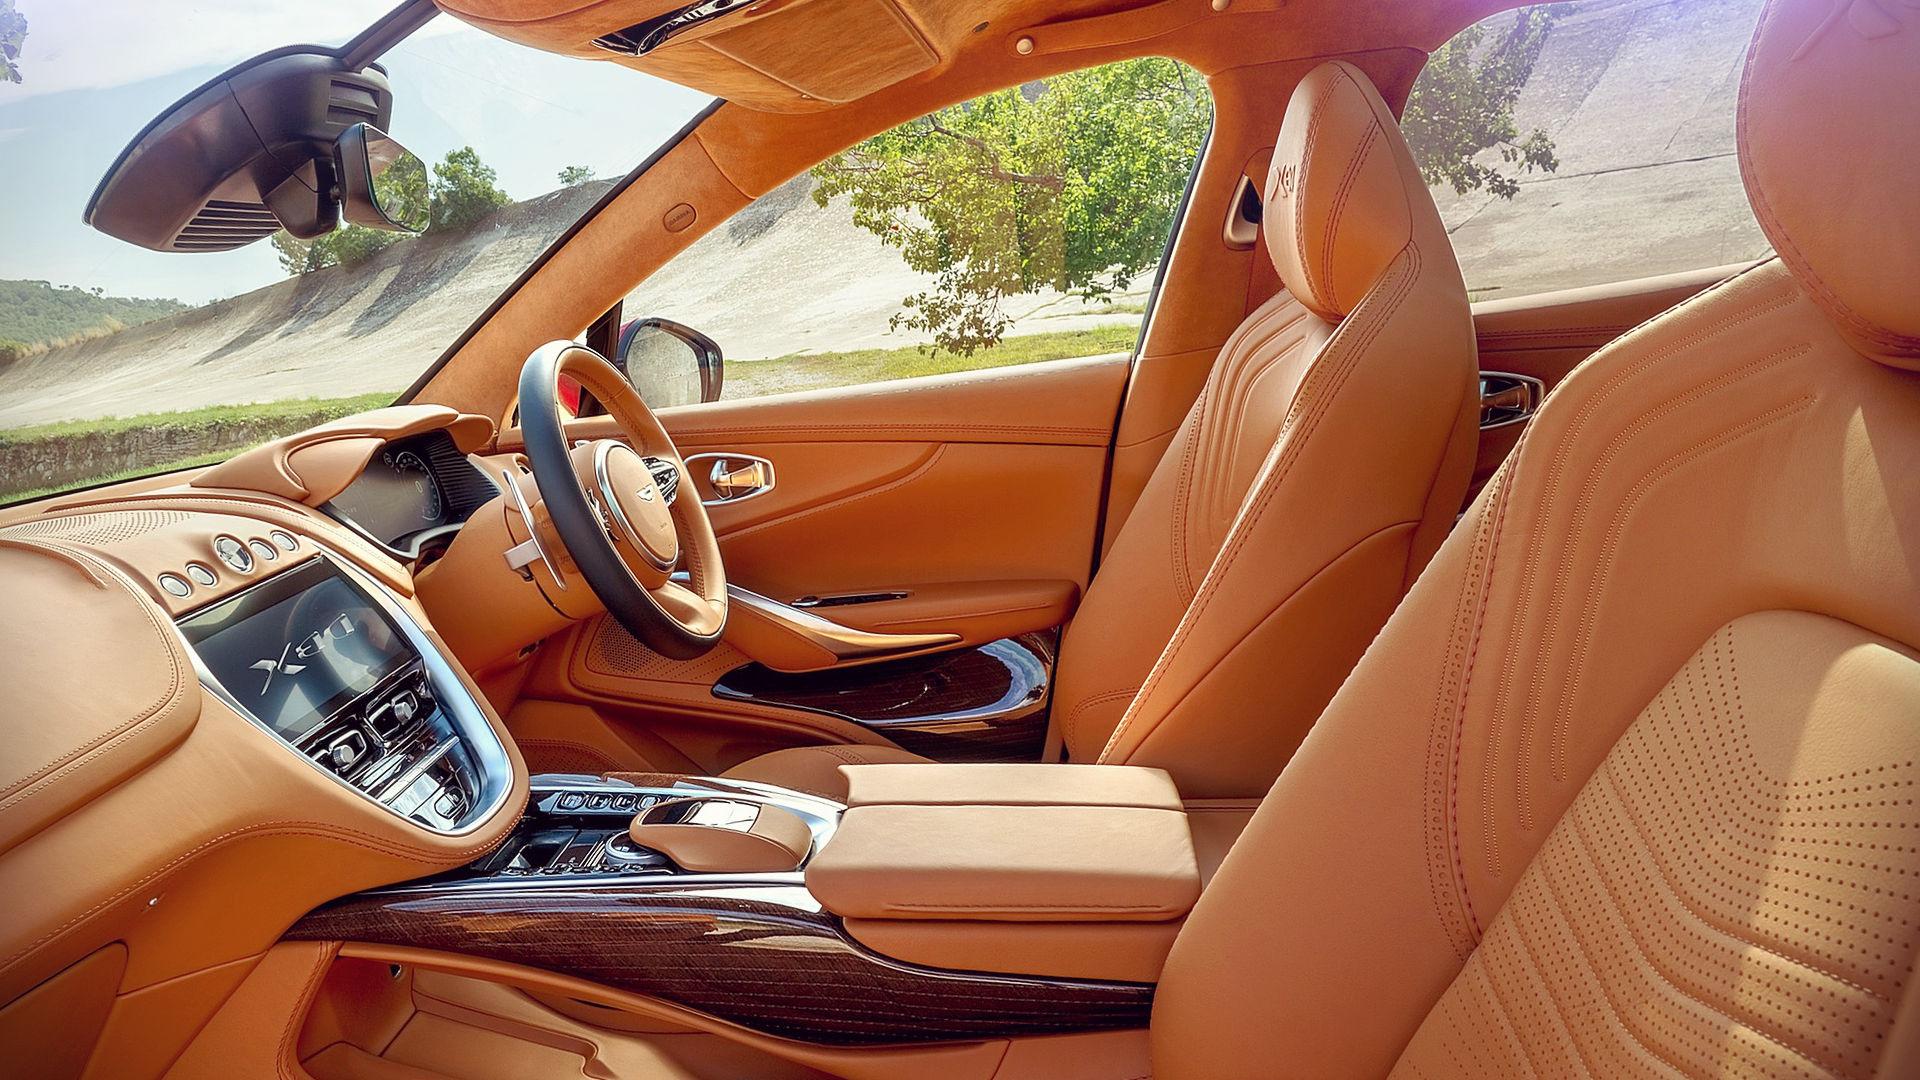 Aston Martin Dbx Suv 2021 Interior Wallpaper